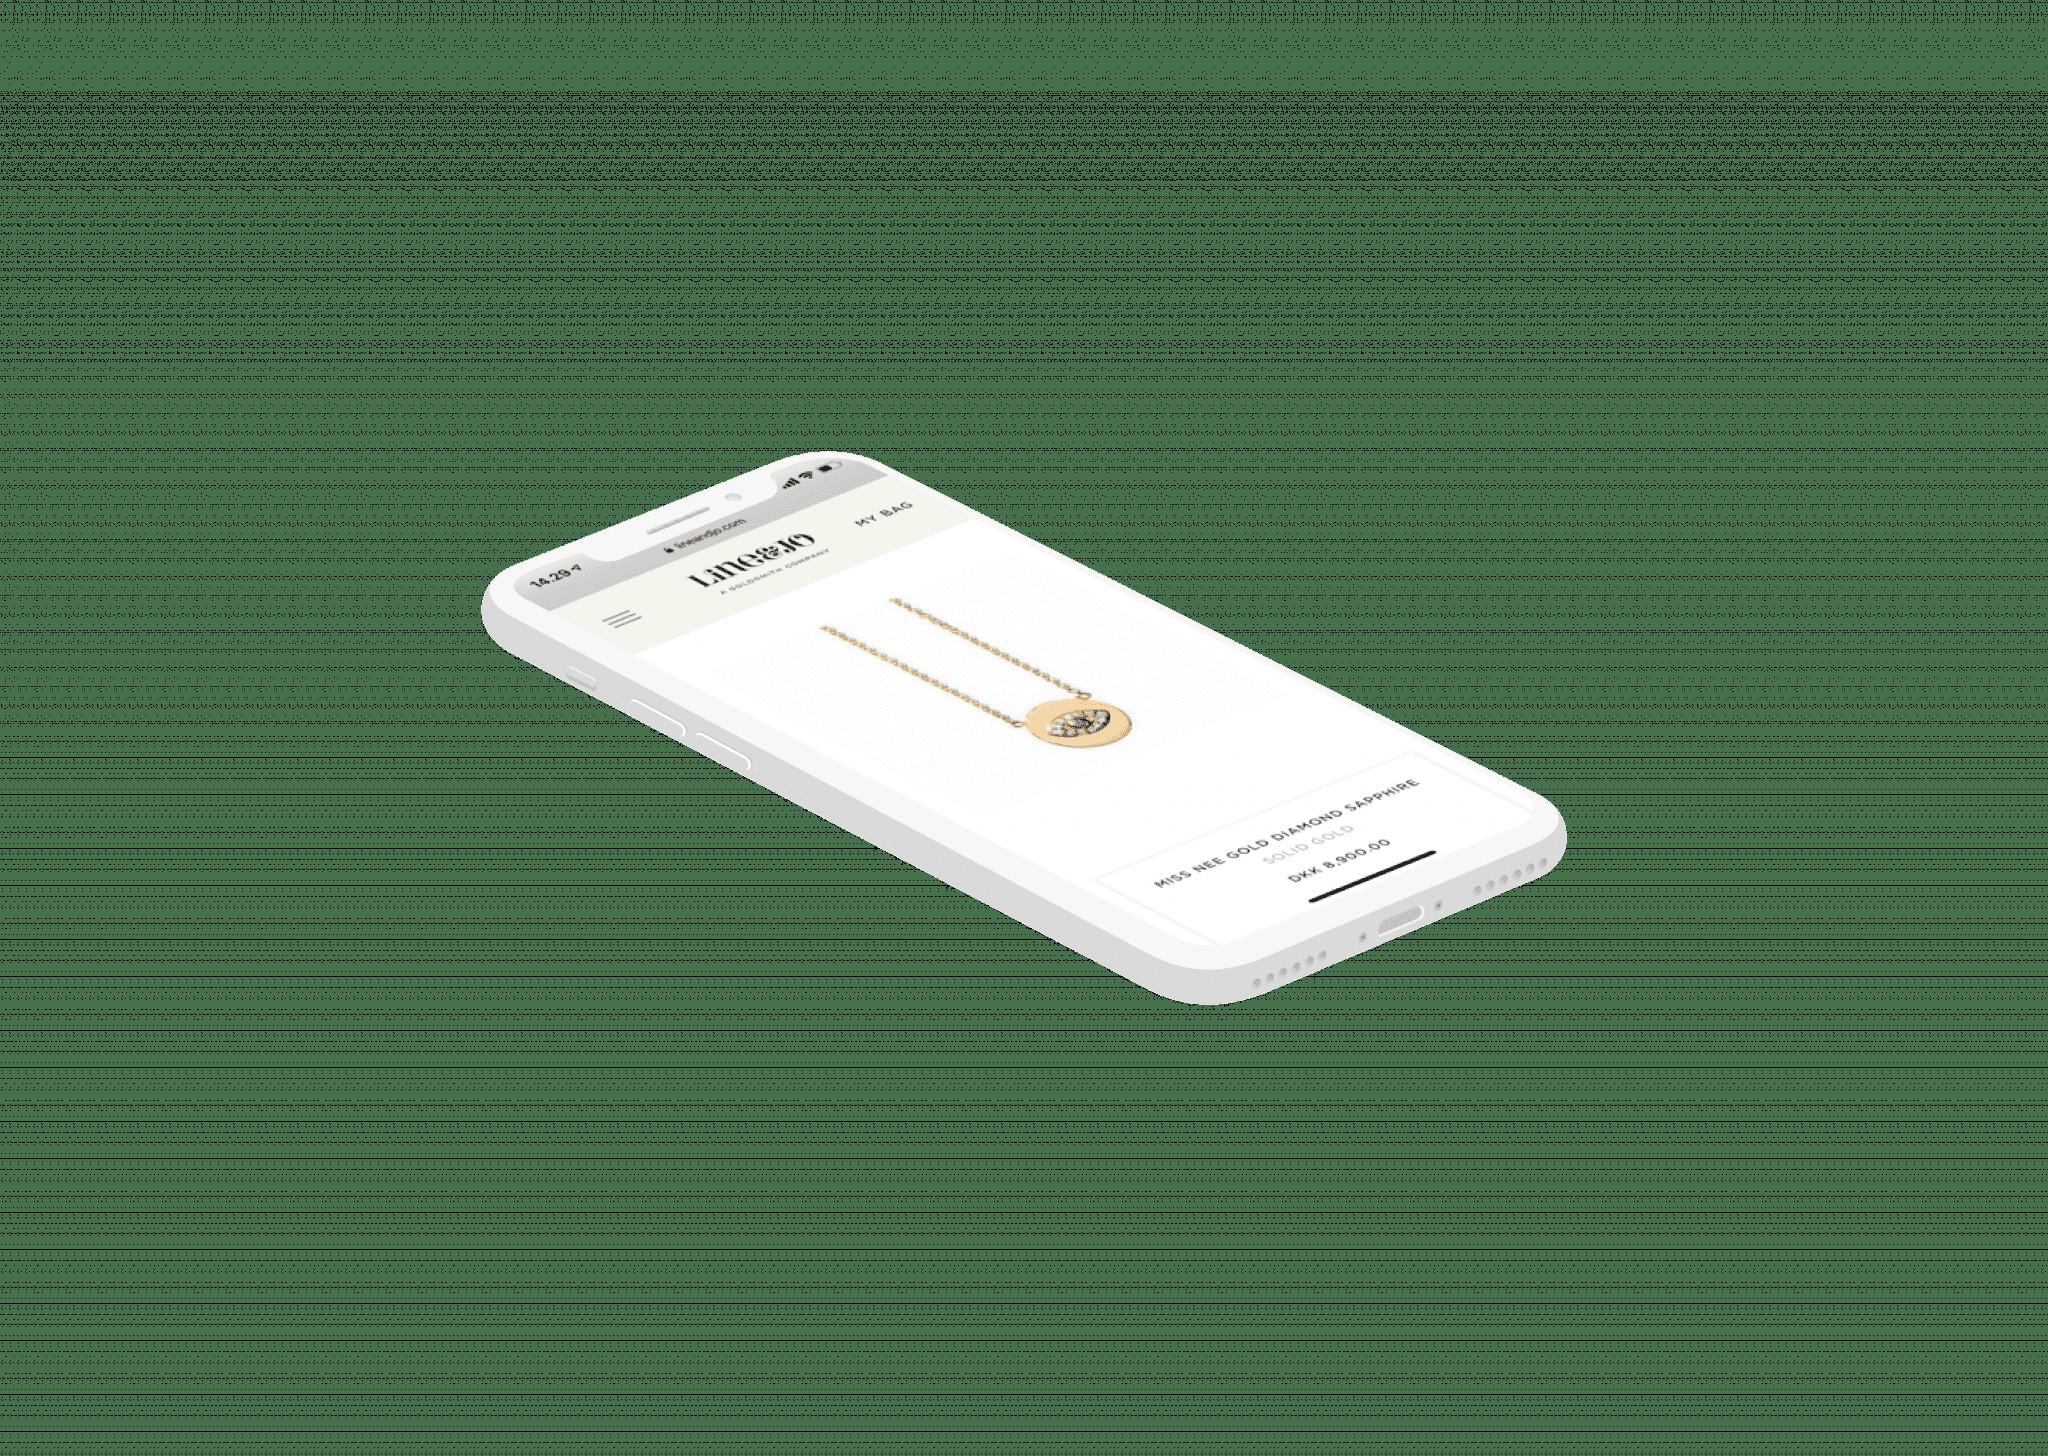 Line_Jo_3 - Iphone X@2x